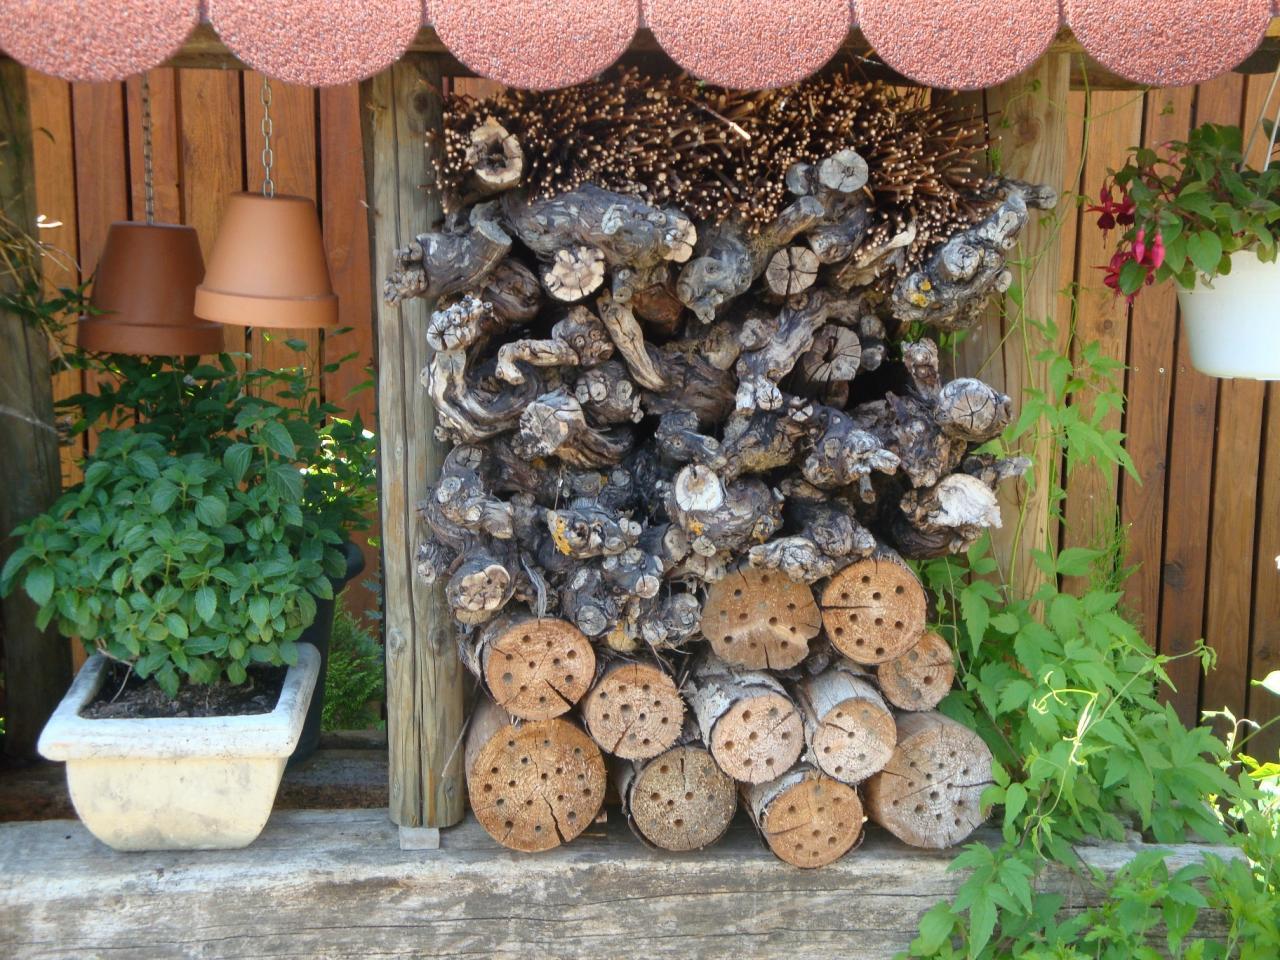 Dise os atractivos para jardines peque os lifestyle de for Jardines pequenos decorados con piedras